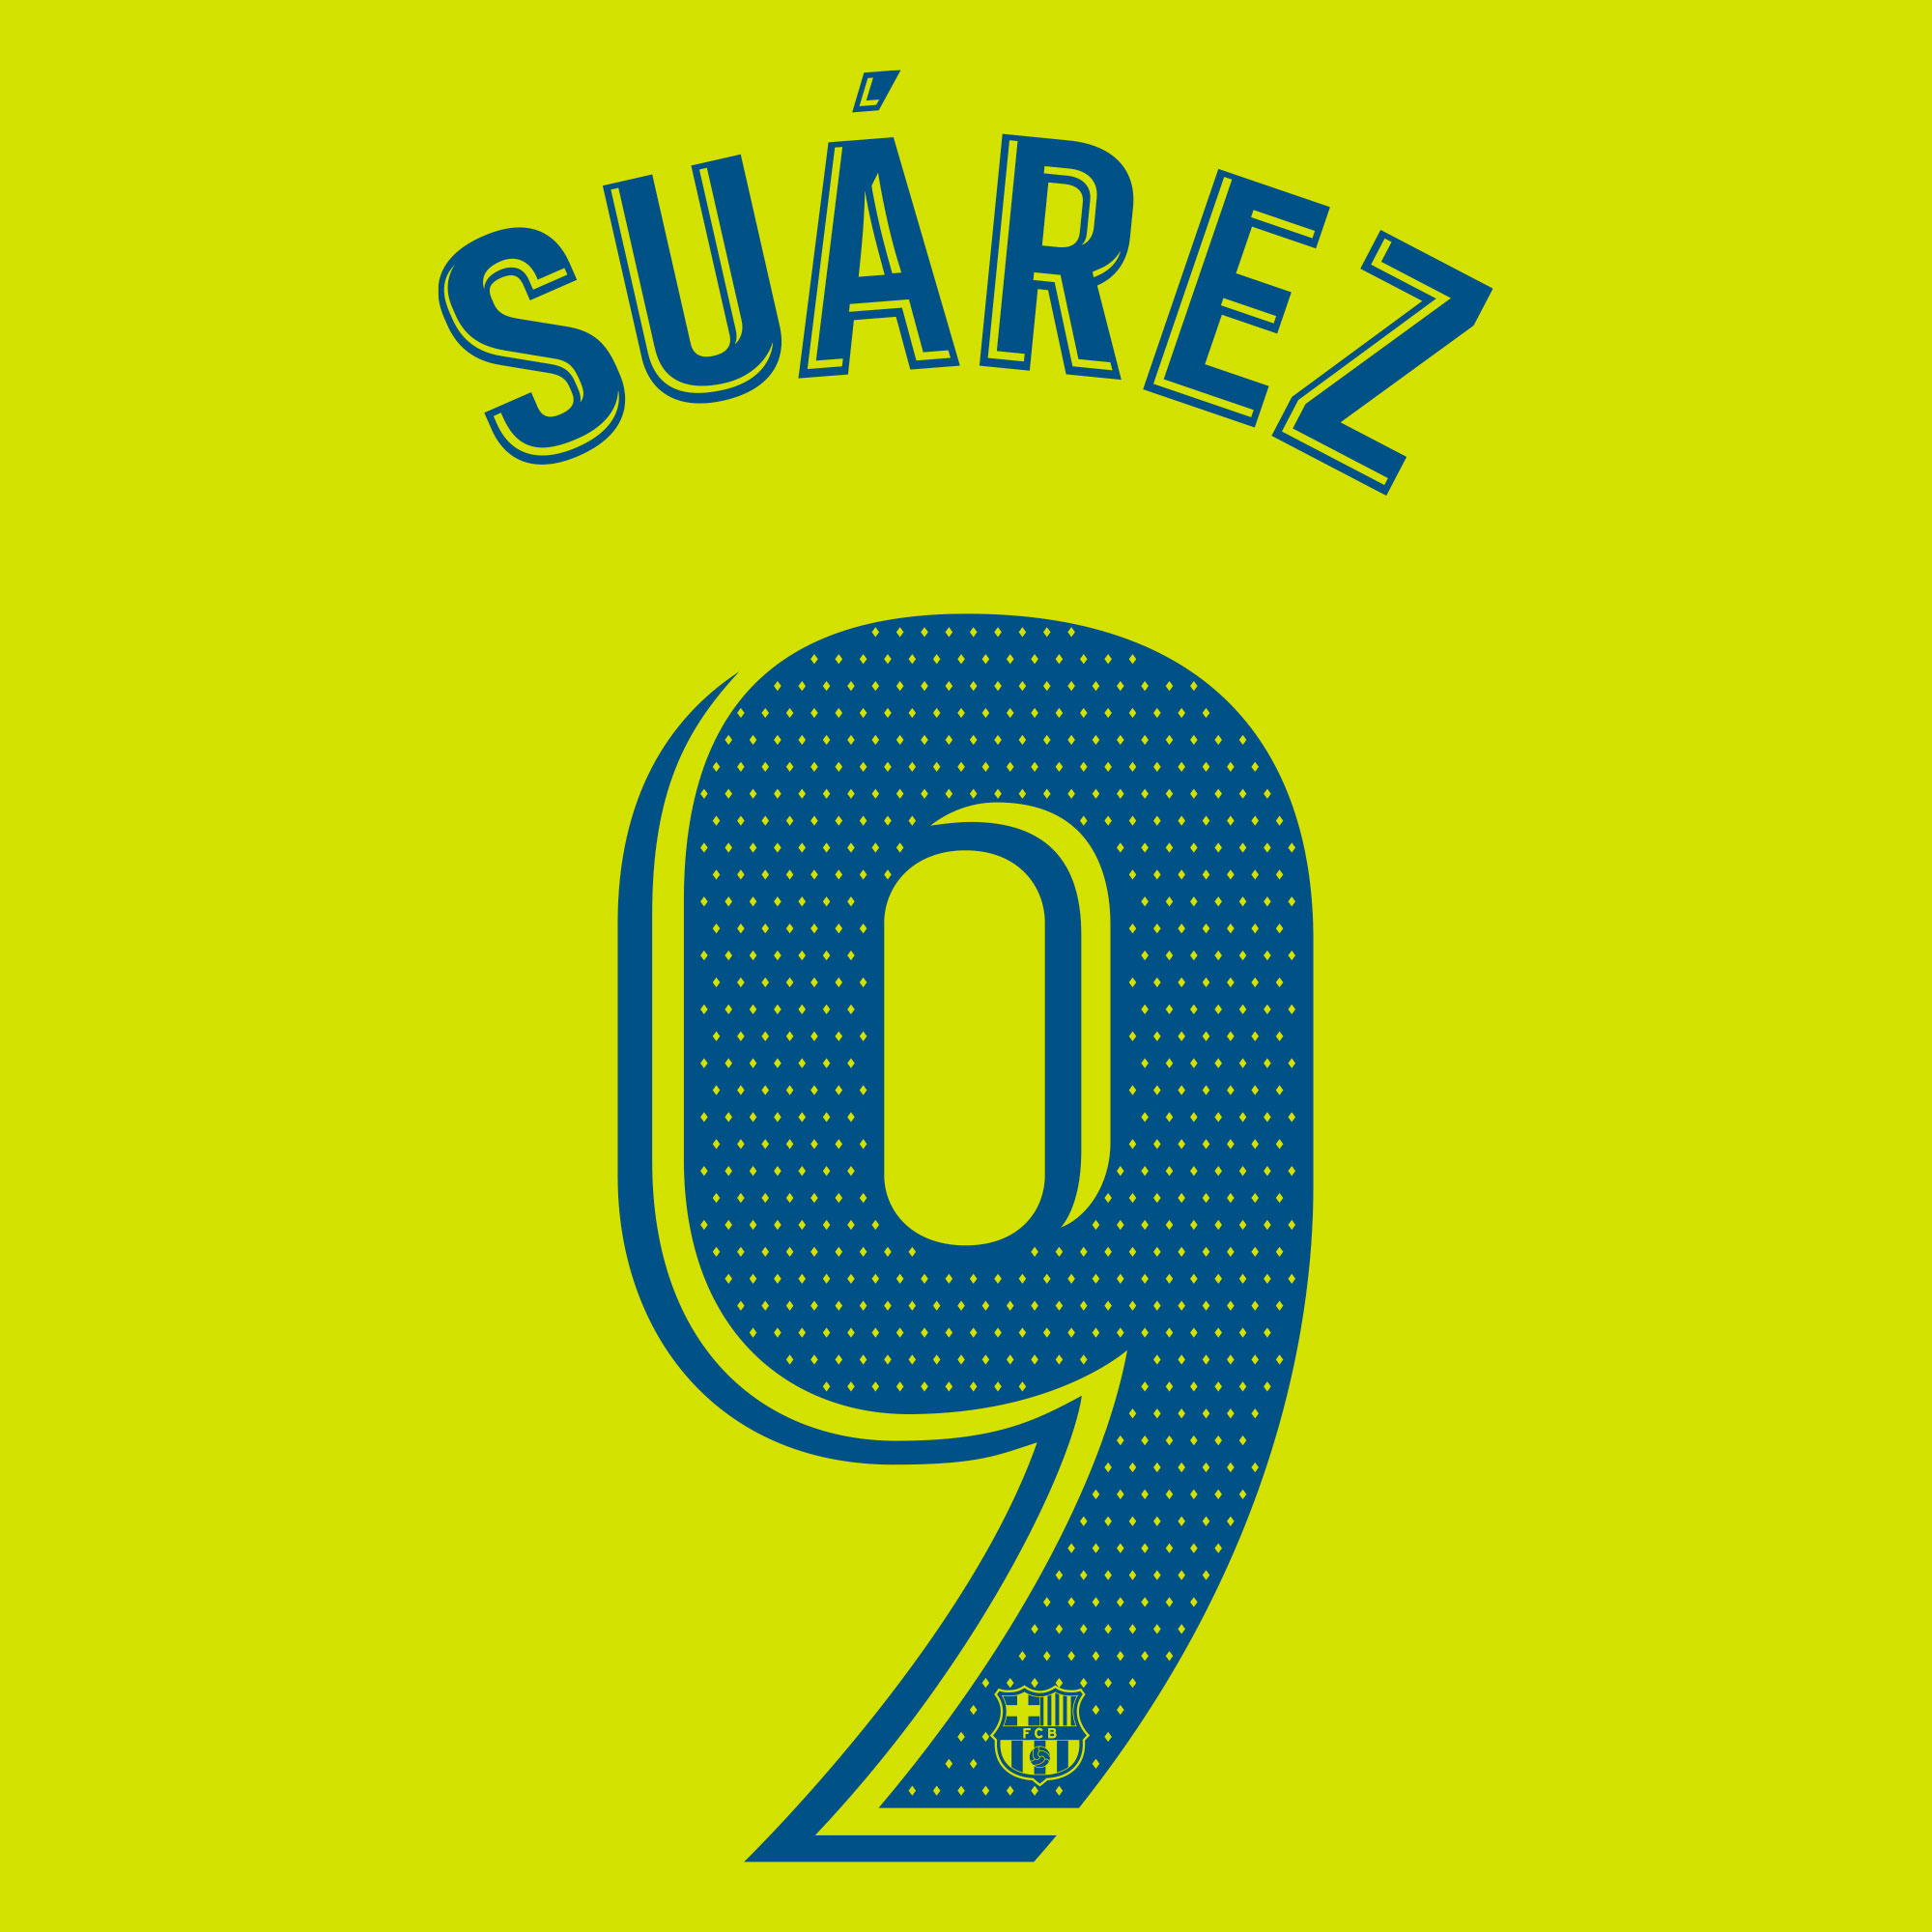 Suarez 9 (Officiele Bedrukking)